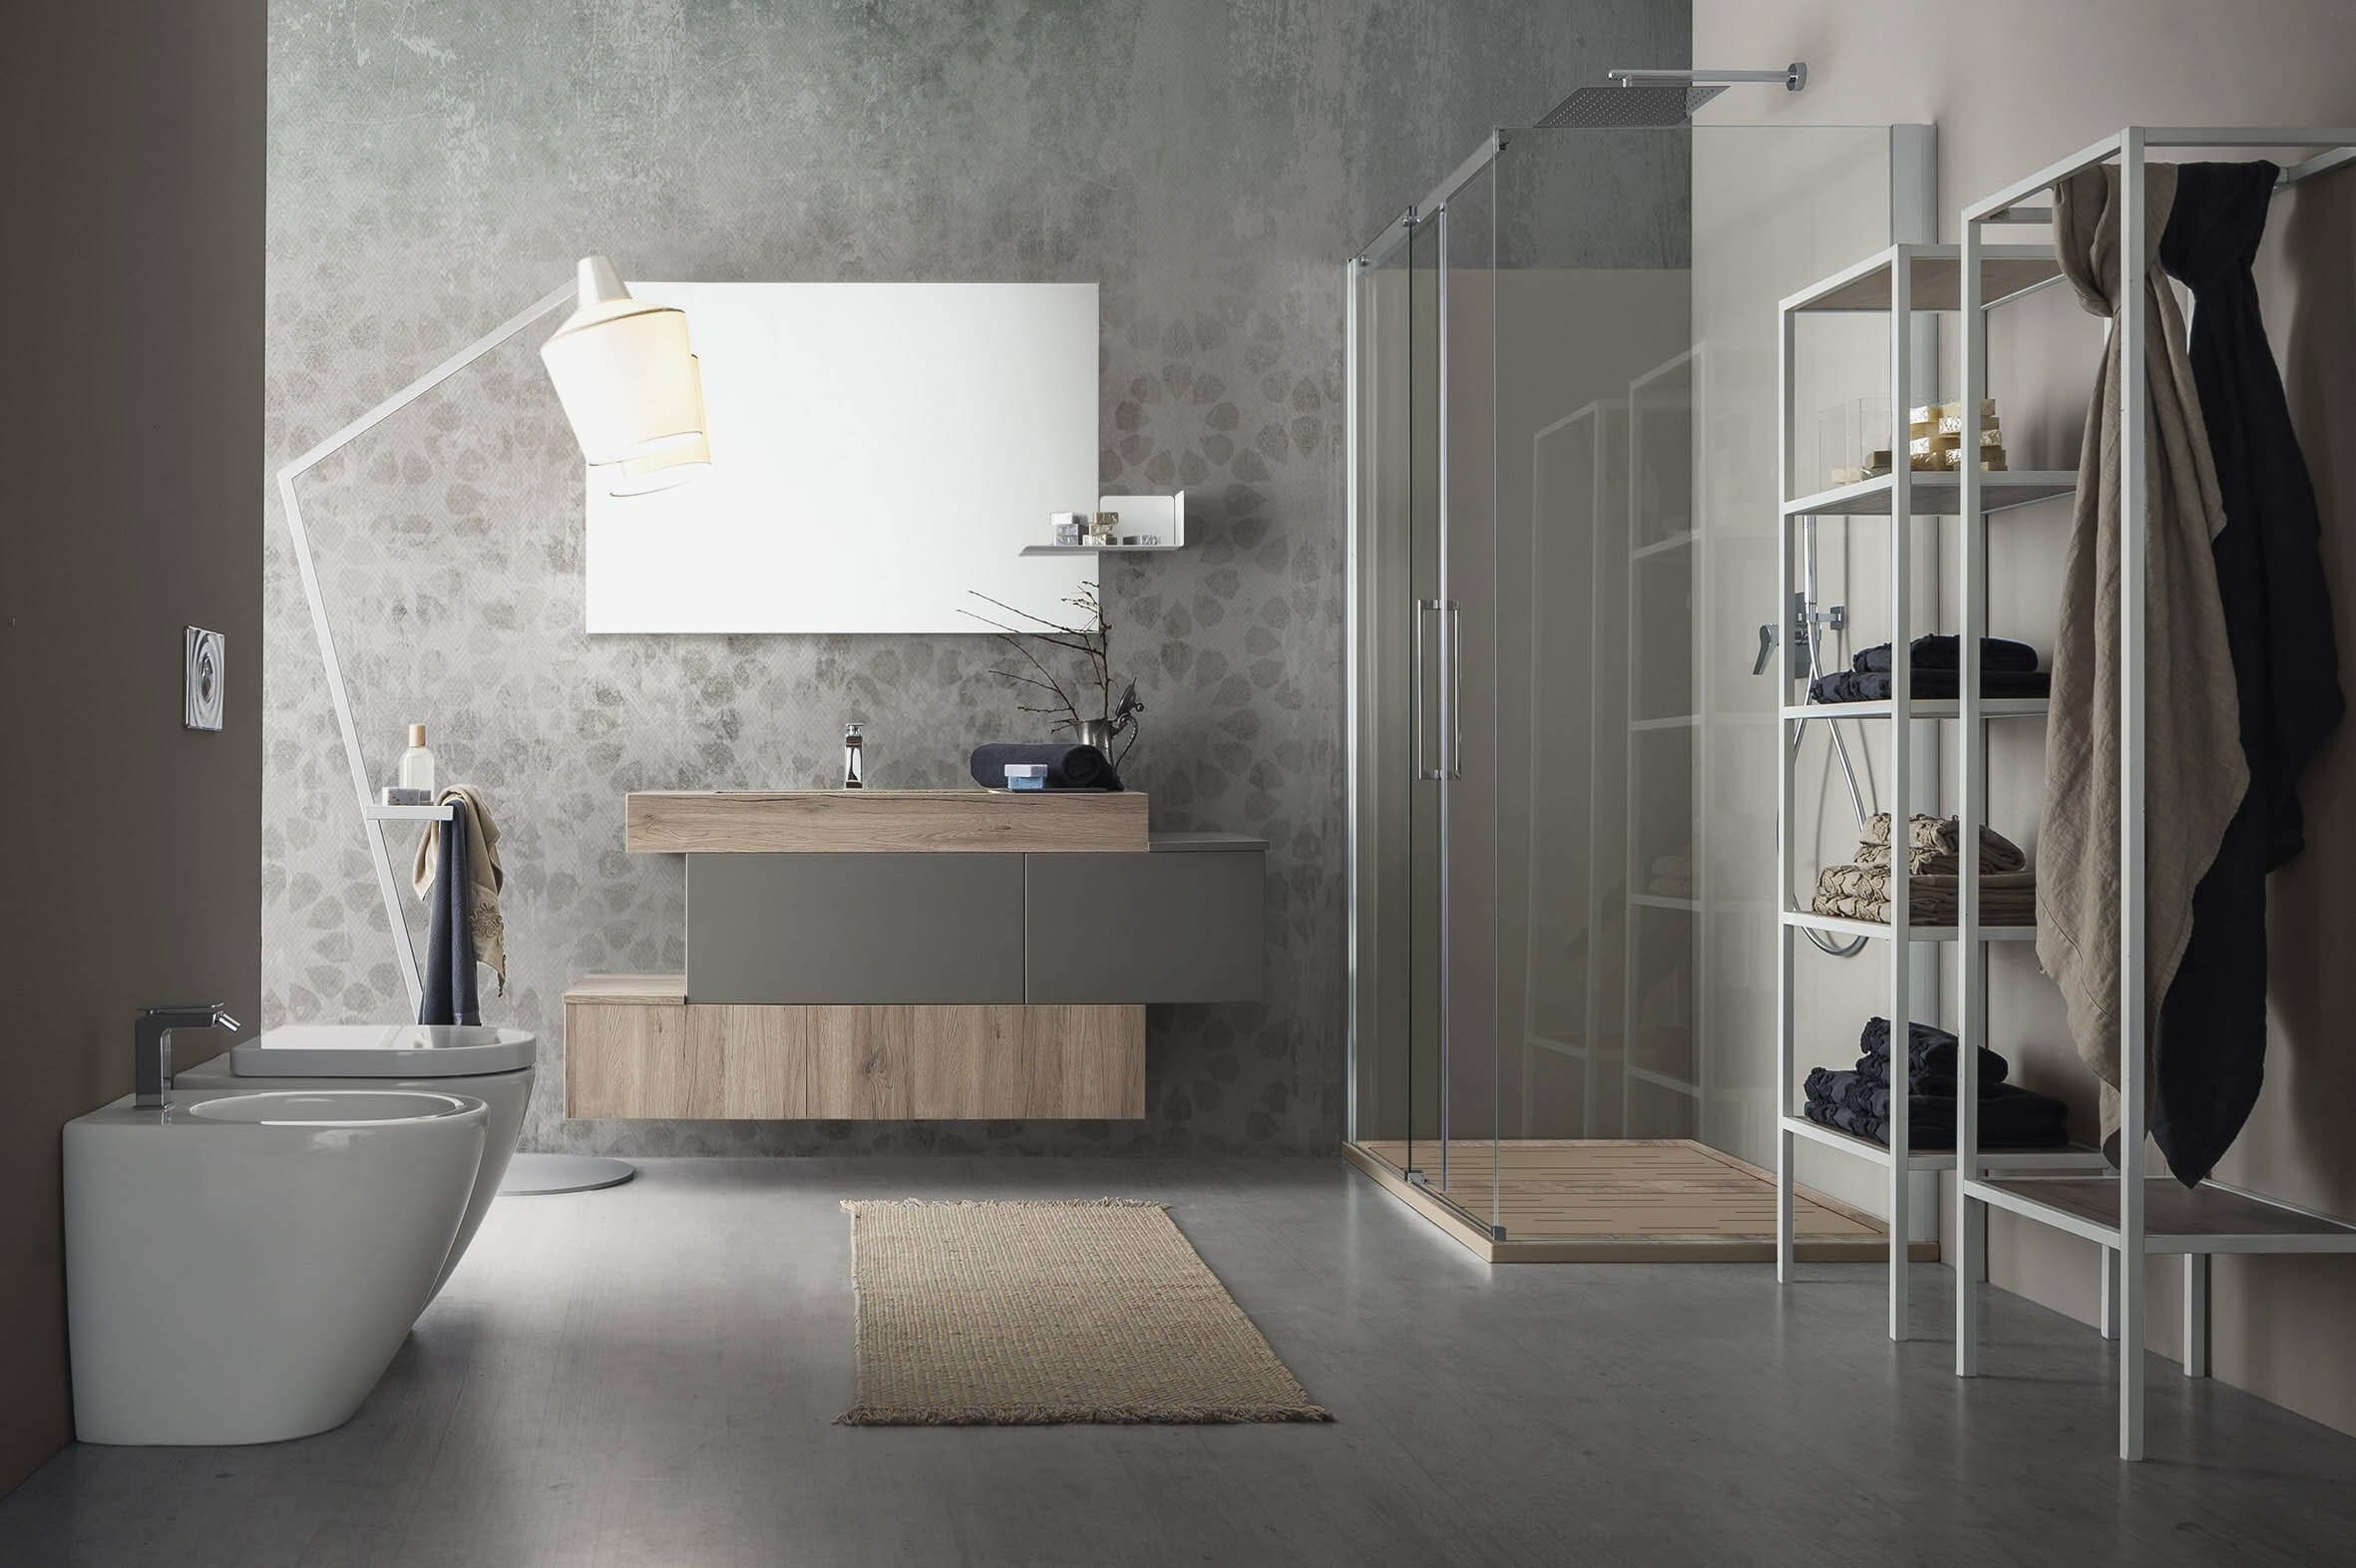 sonos-one-bathroom-speaker | Smart Home Sounds